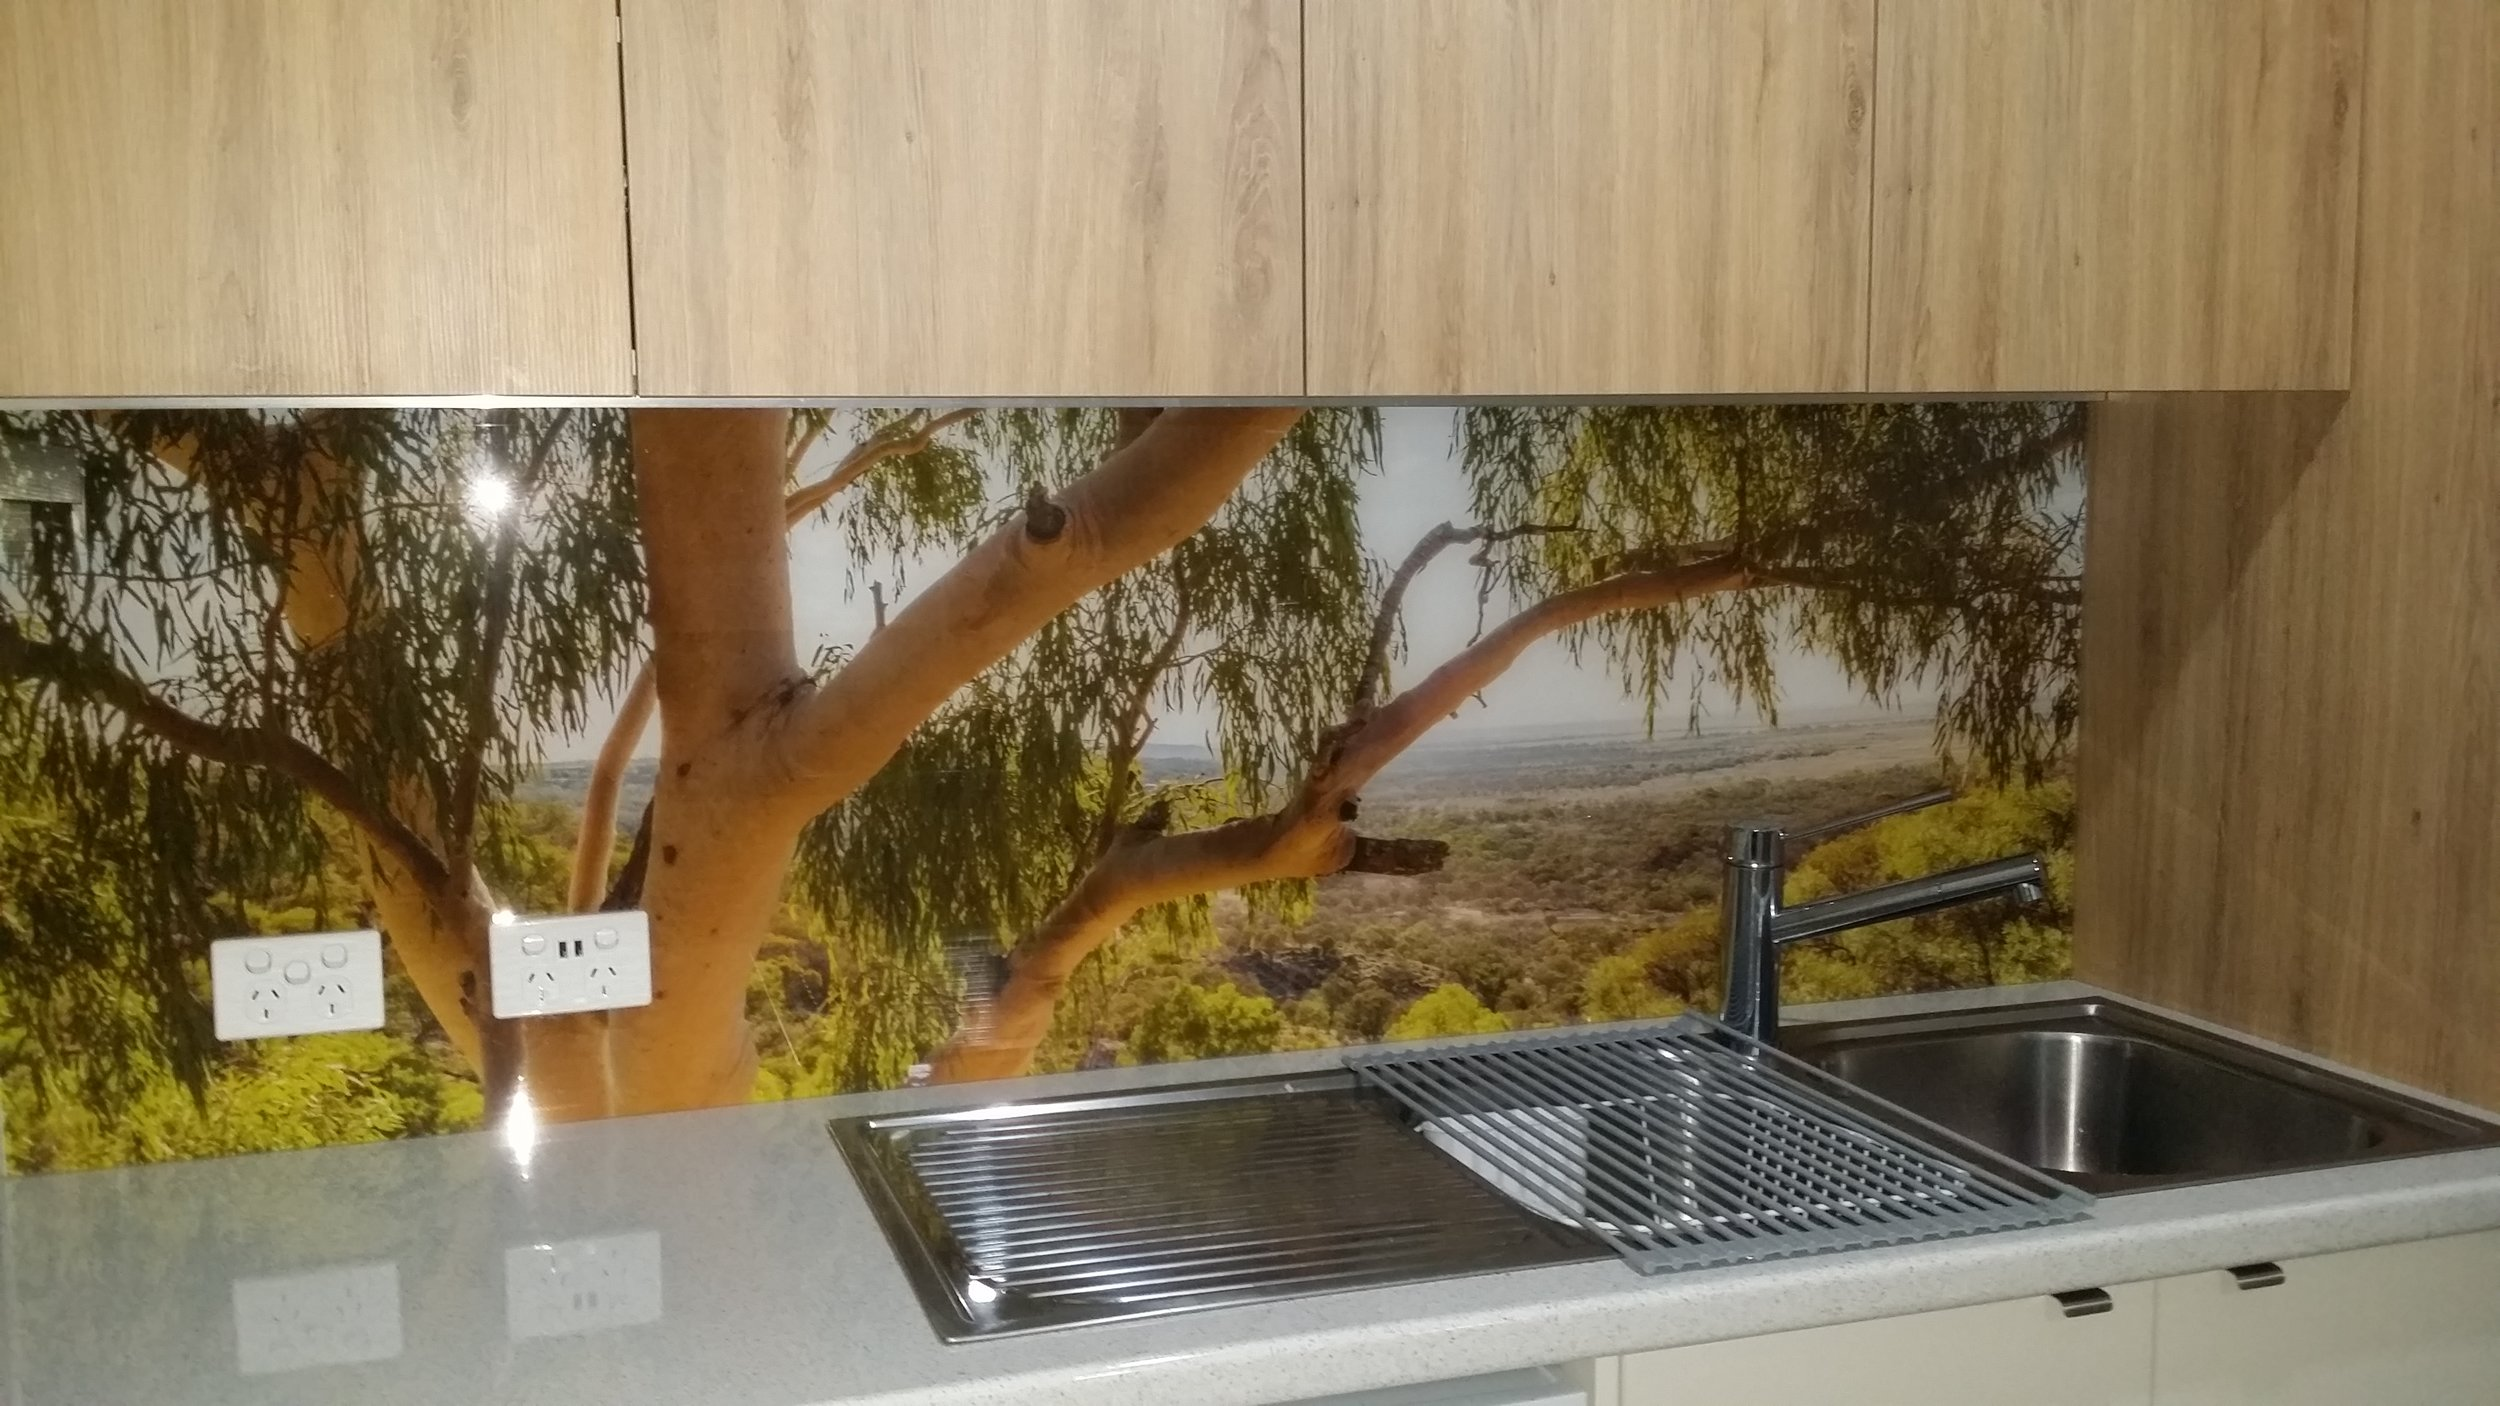 Printed Splashback - Gumtrees and Bush scene